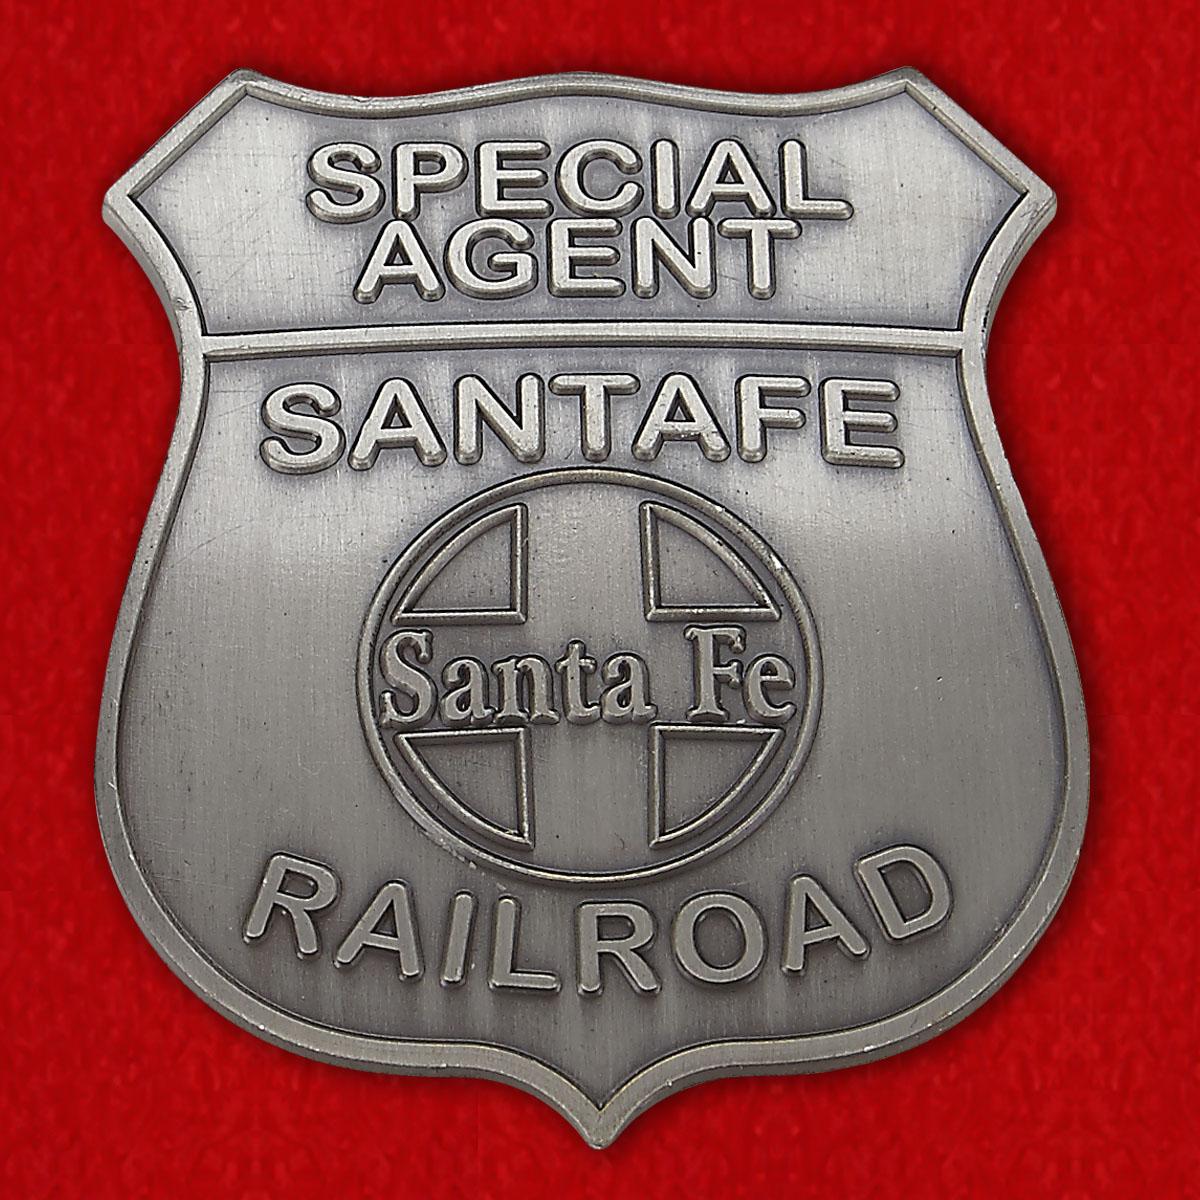 Special Agent Raulroad Sata Fe Token